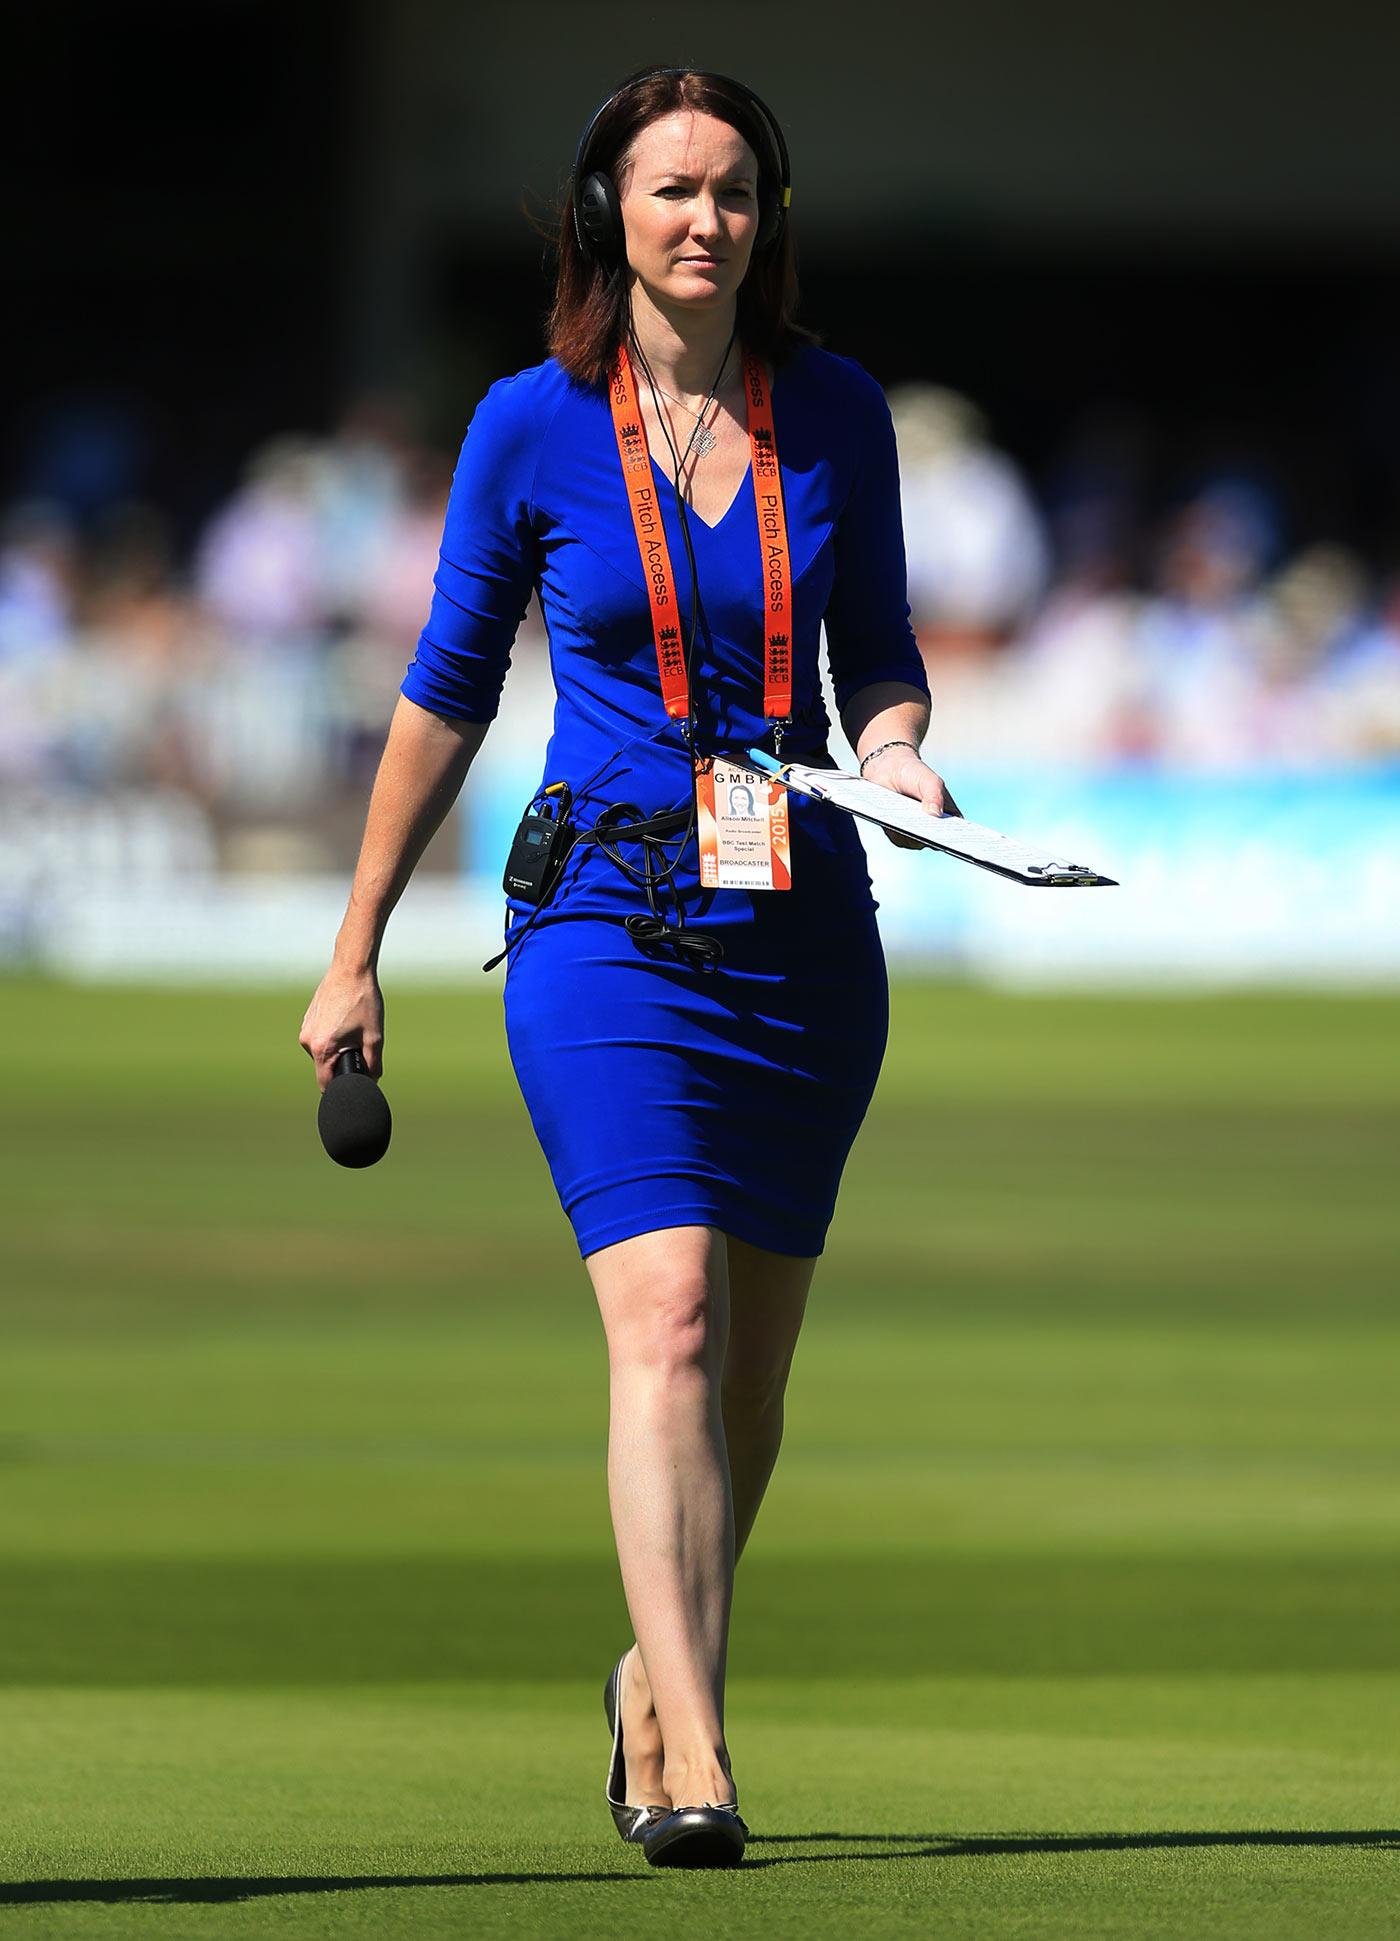 Girls aloud | The Cricket Monthly | ESPN Cricinfo